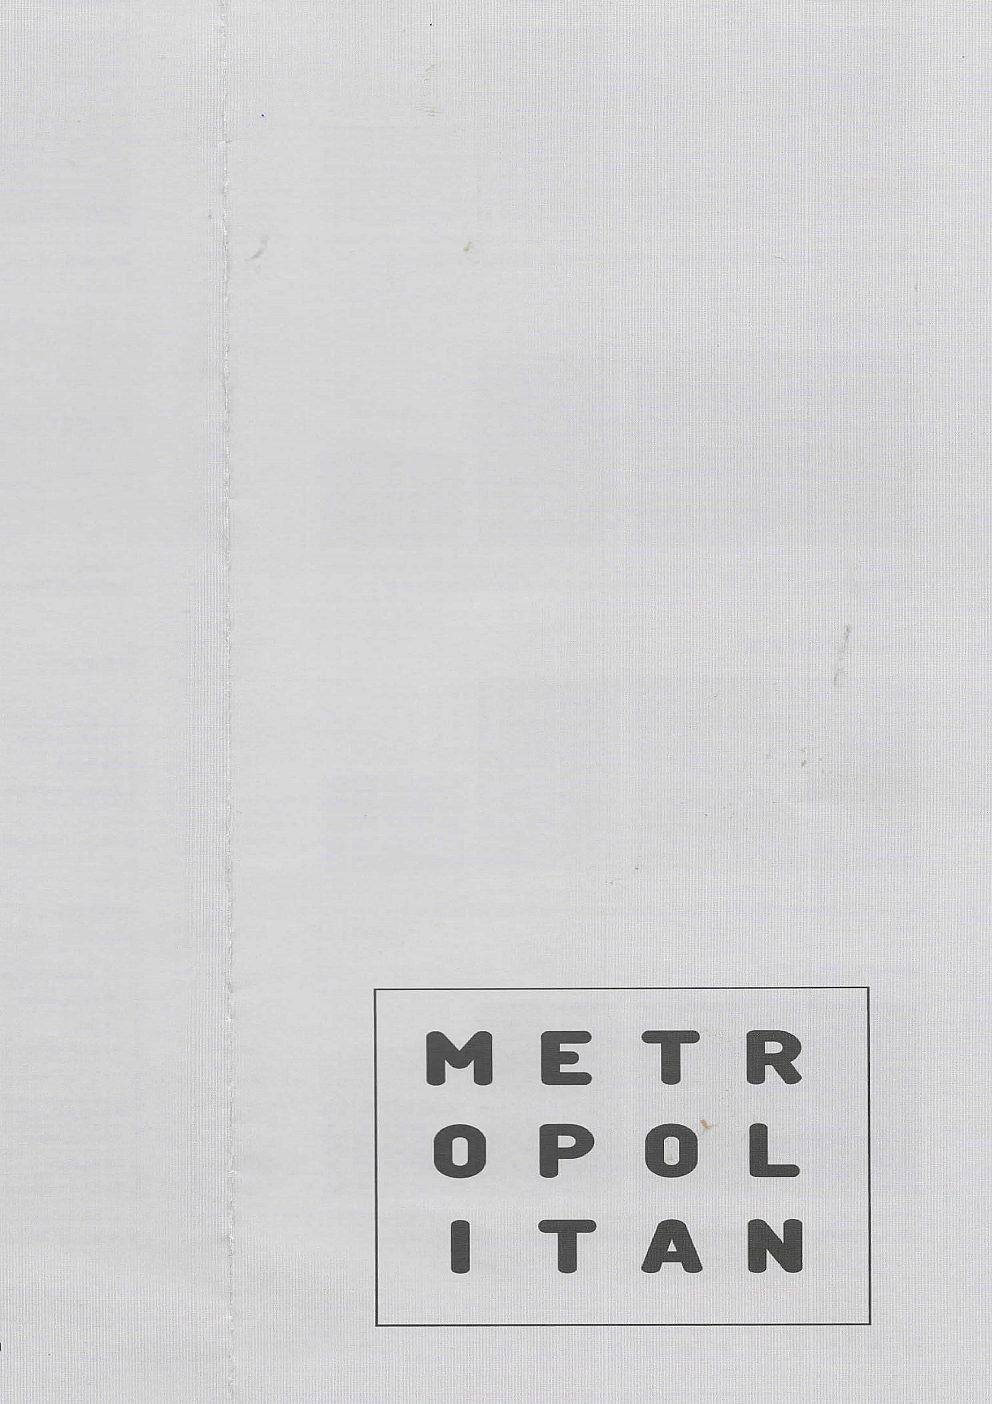 Imso - Metropolitan